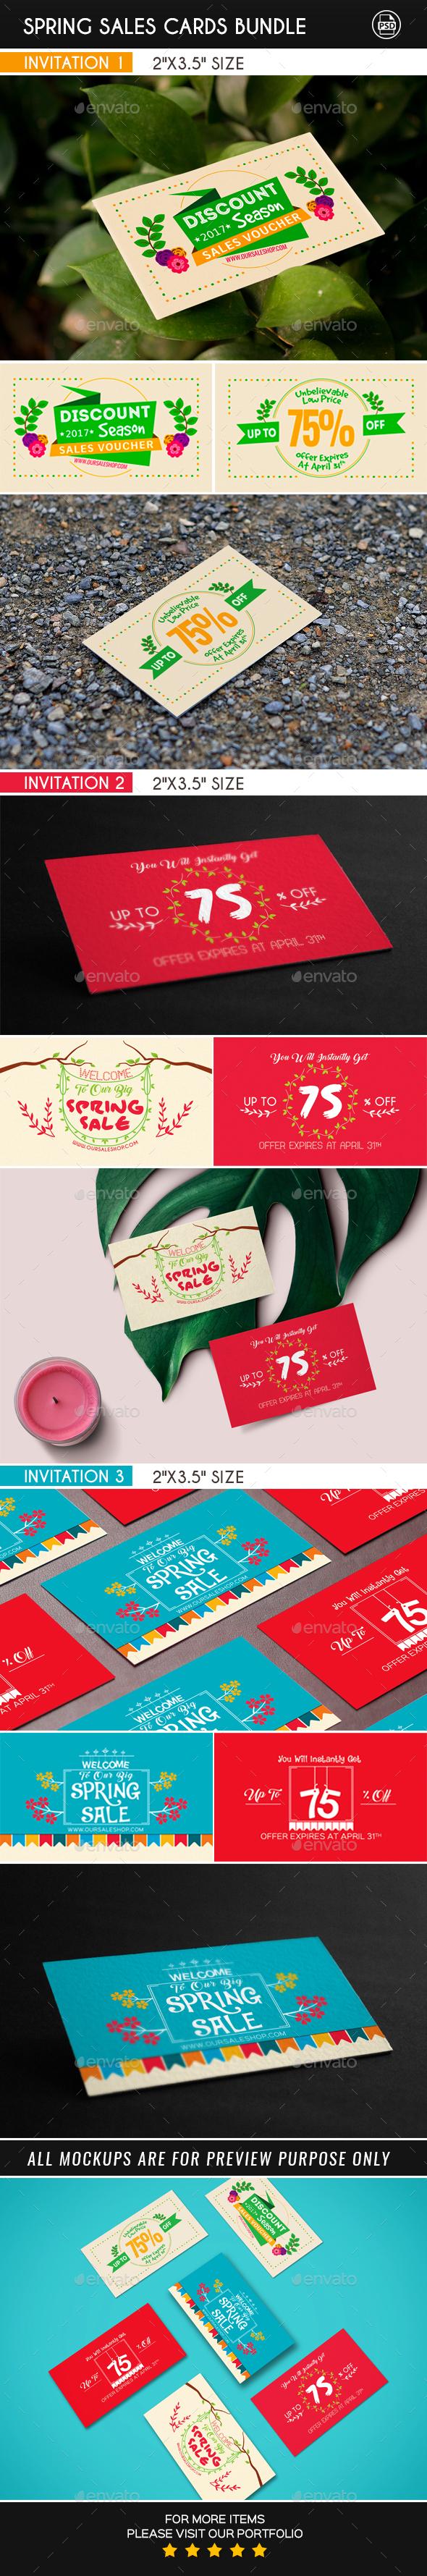 Spring Sales Cards Bundle - Loyalty Cards Cards & Invites